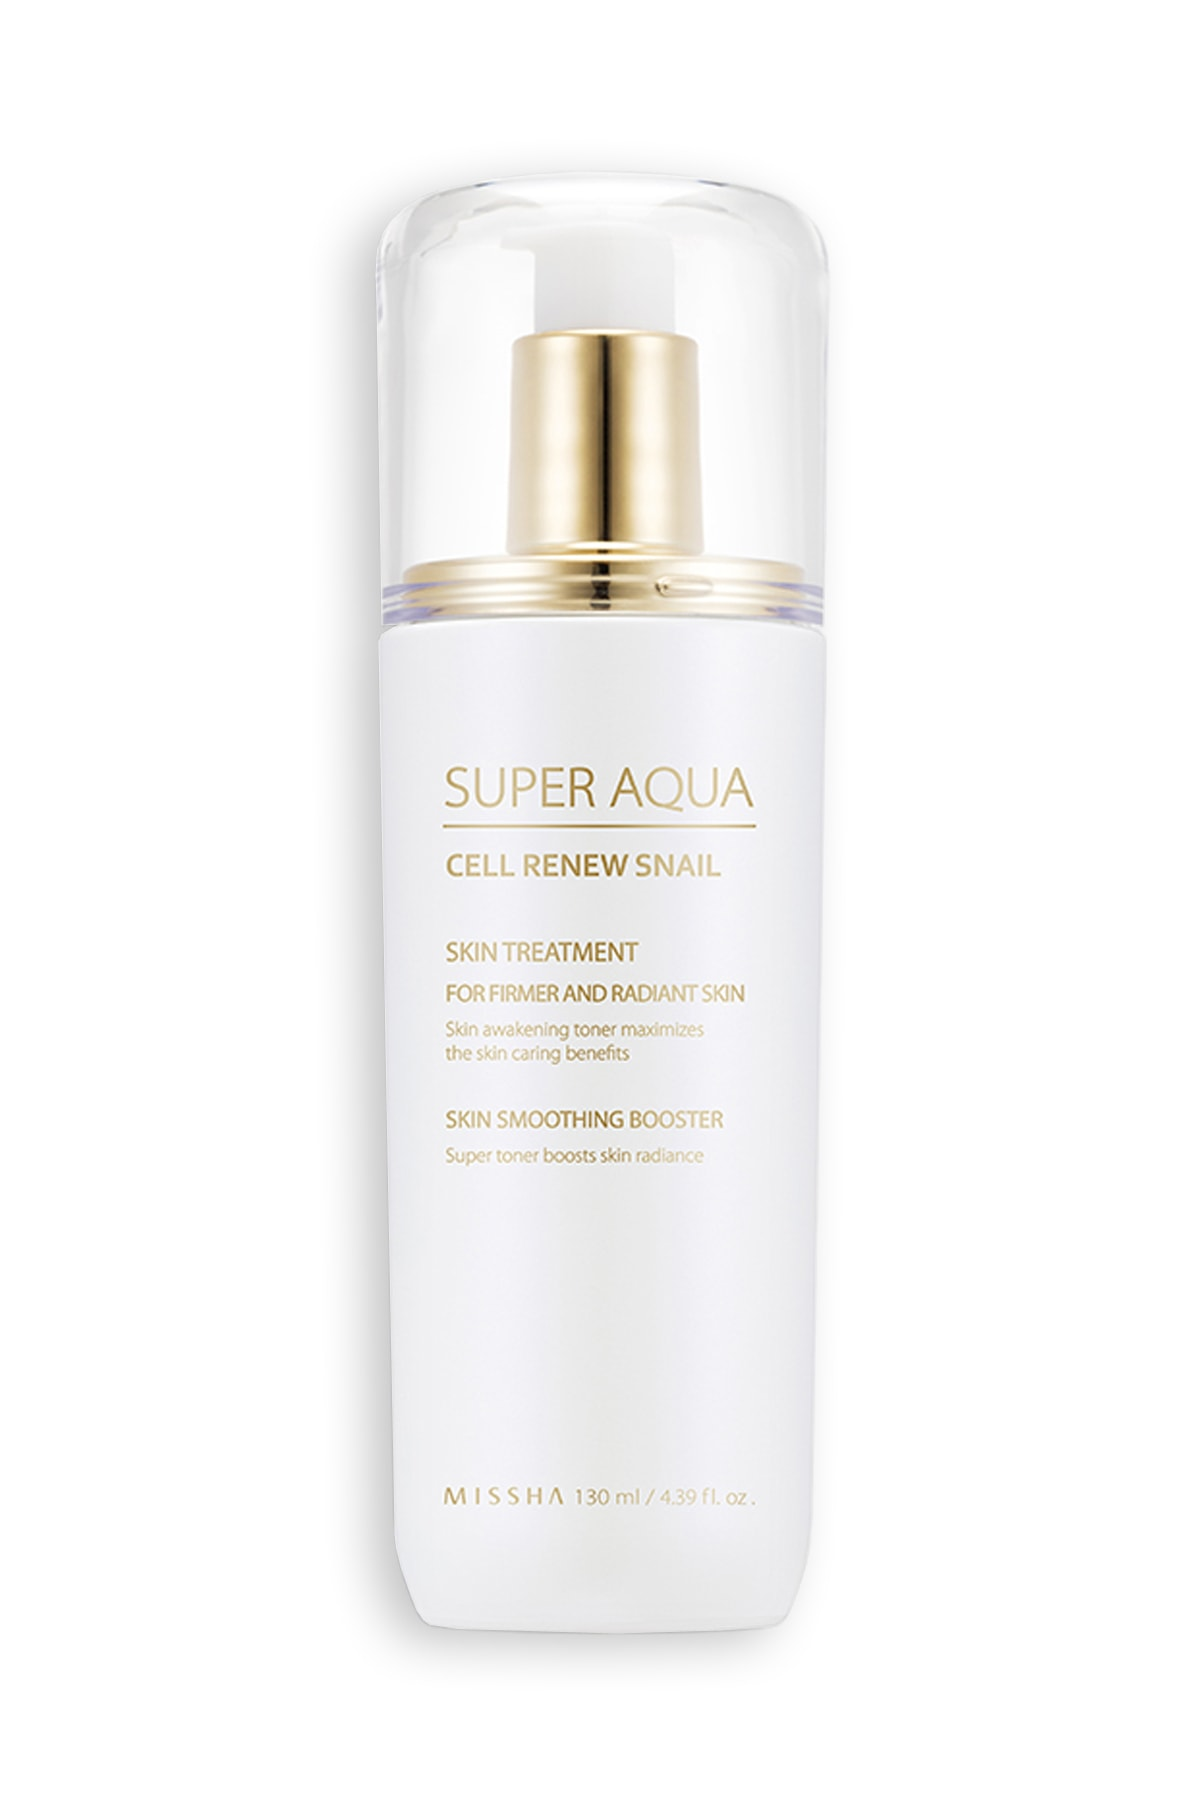 Missha Nemlendirici Tonik - Super Aqua Cell Renew Snail Skin Treatment 8809581458567